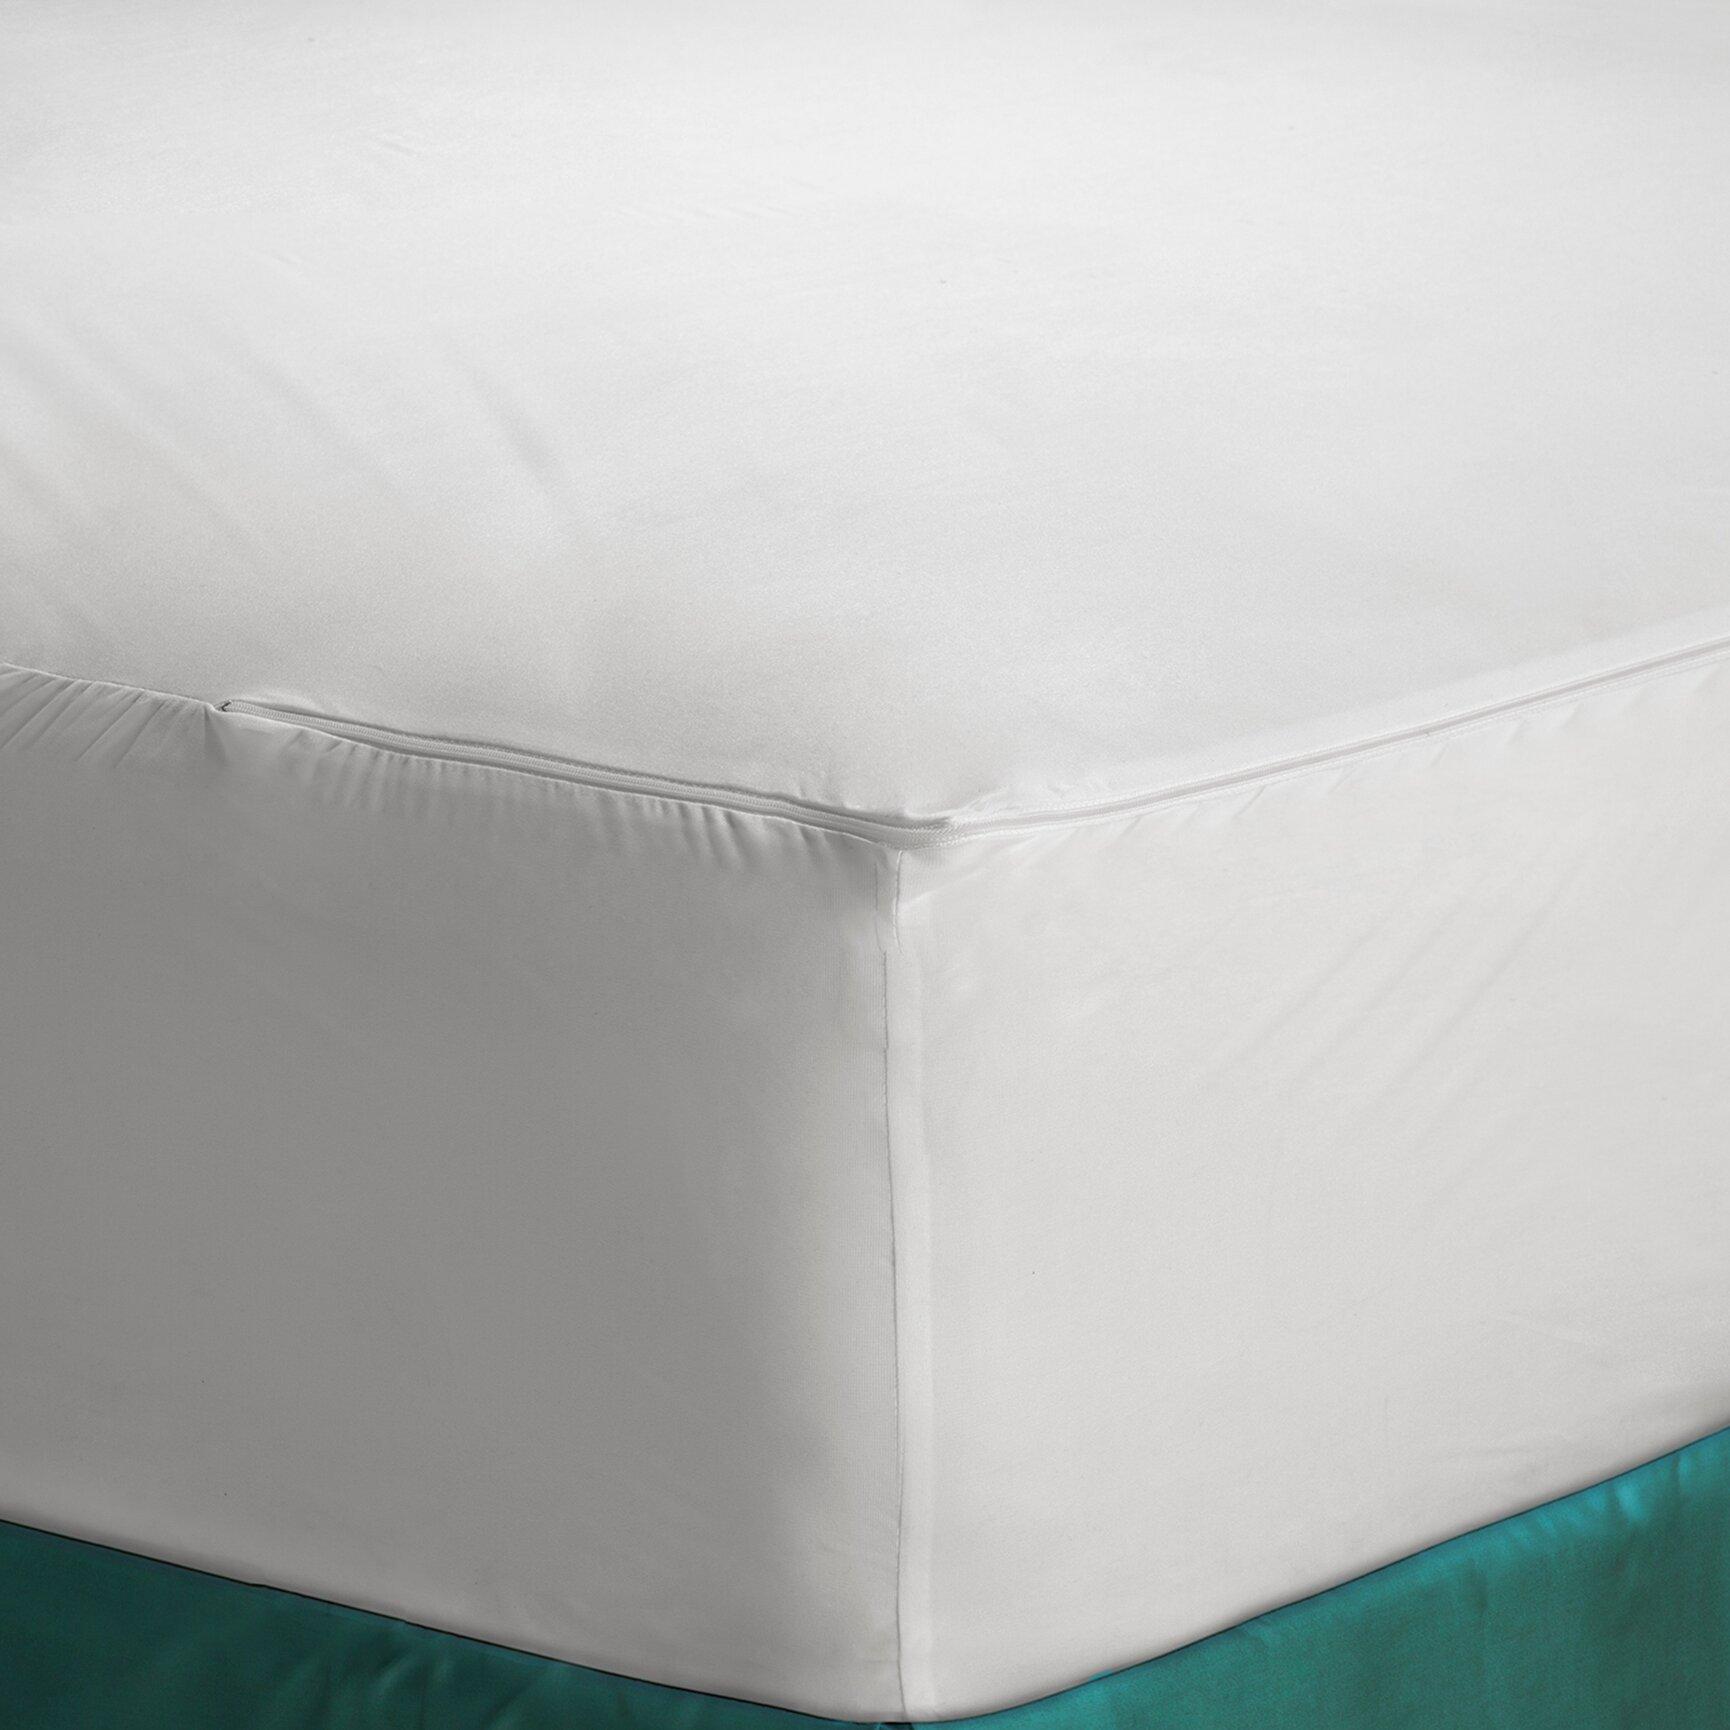 Allerease Dog Bed Protectors